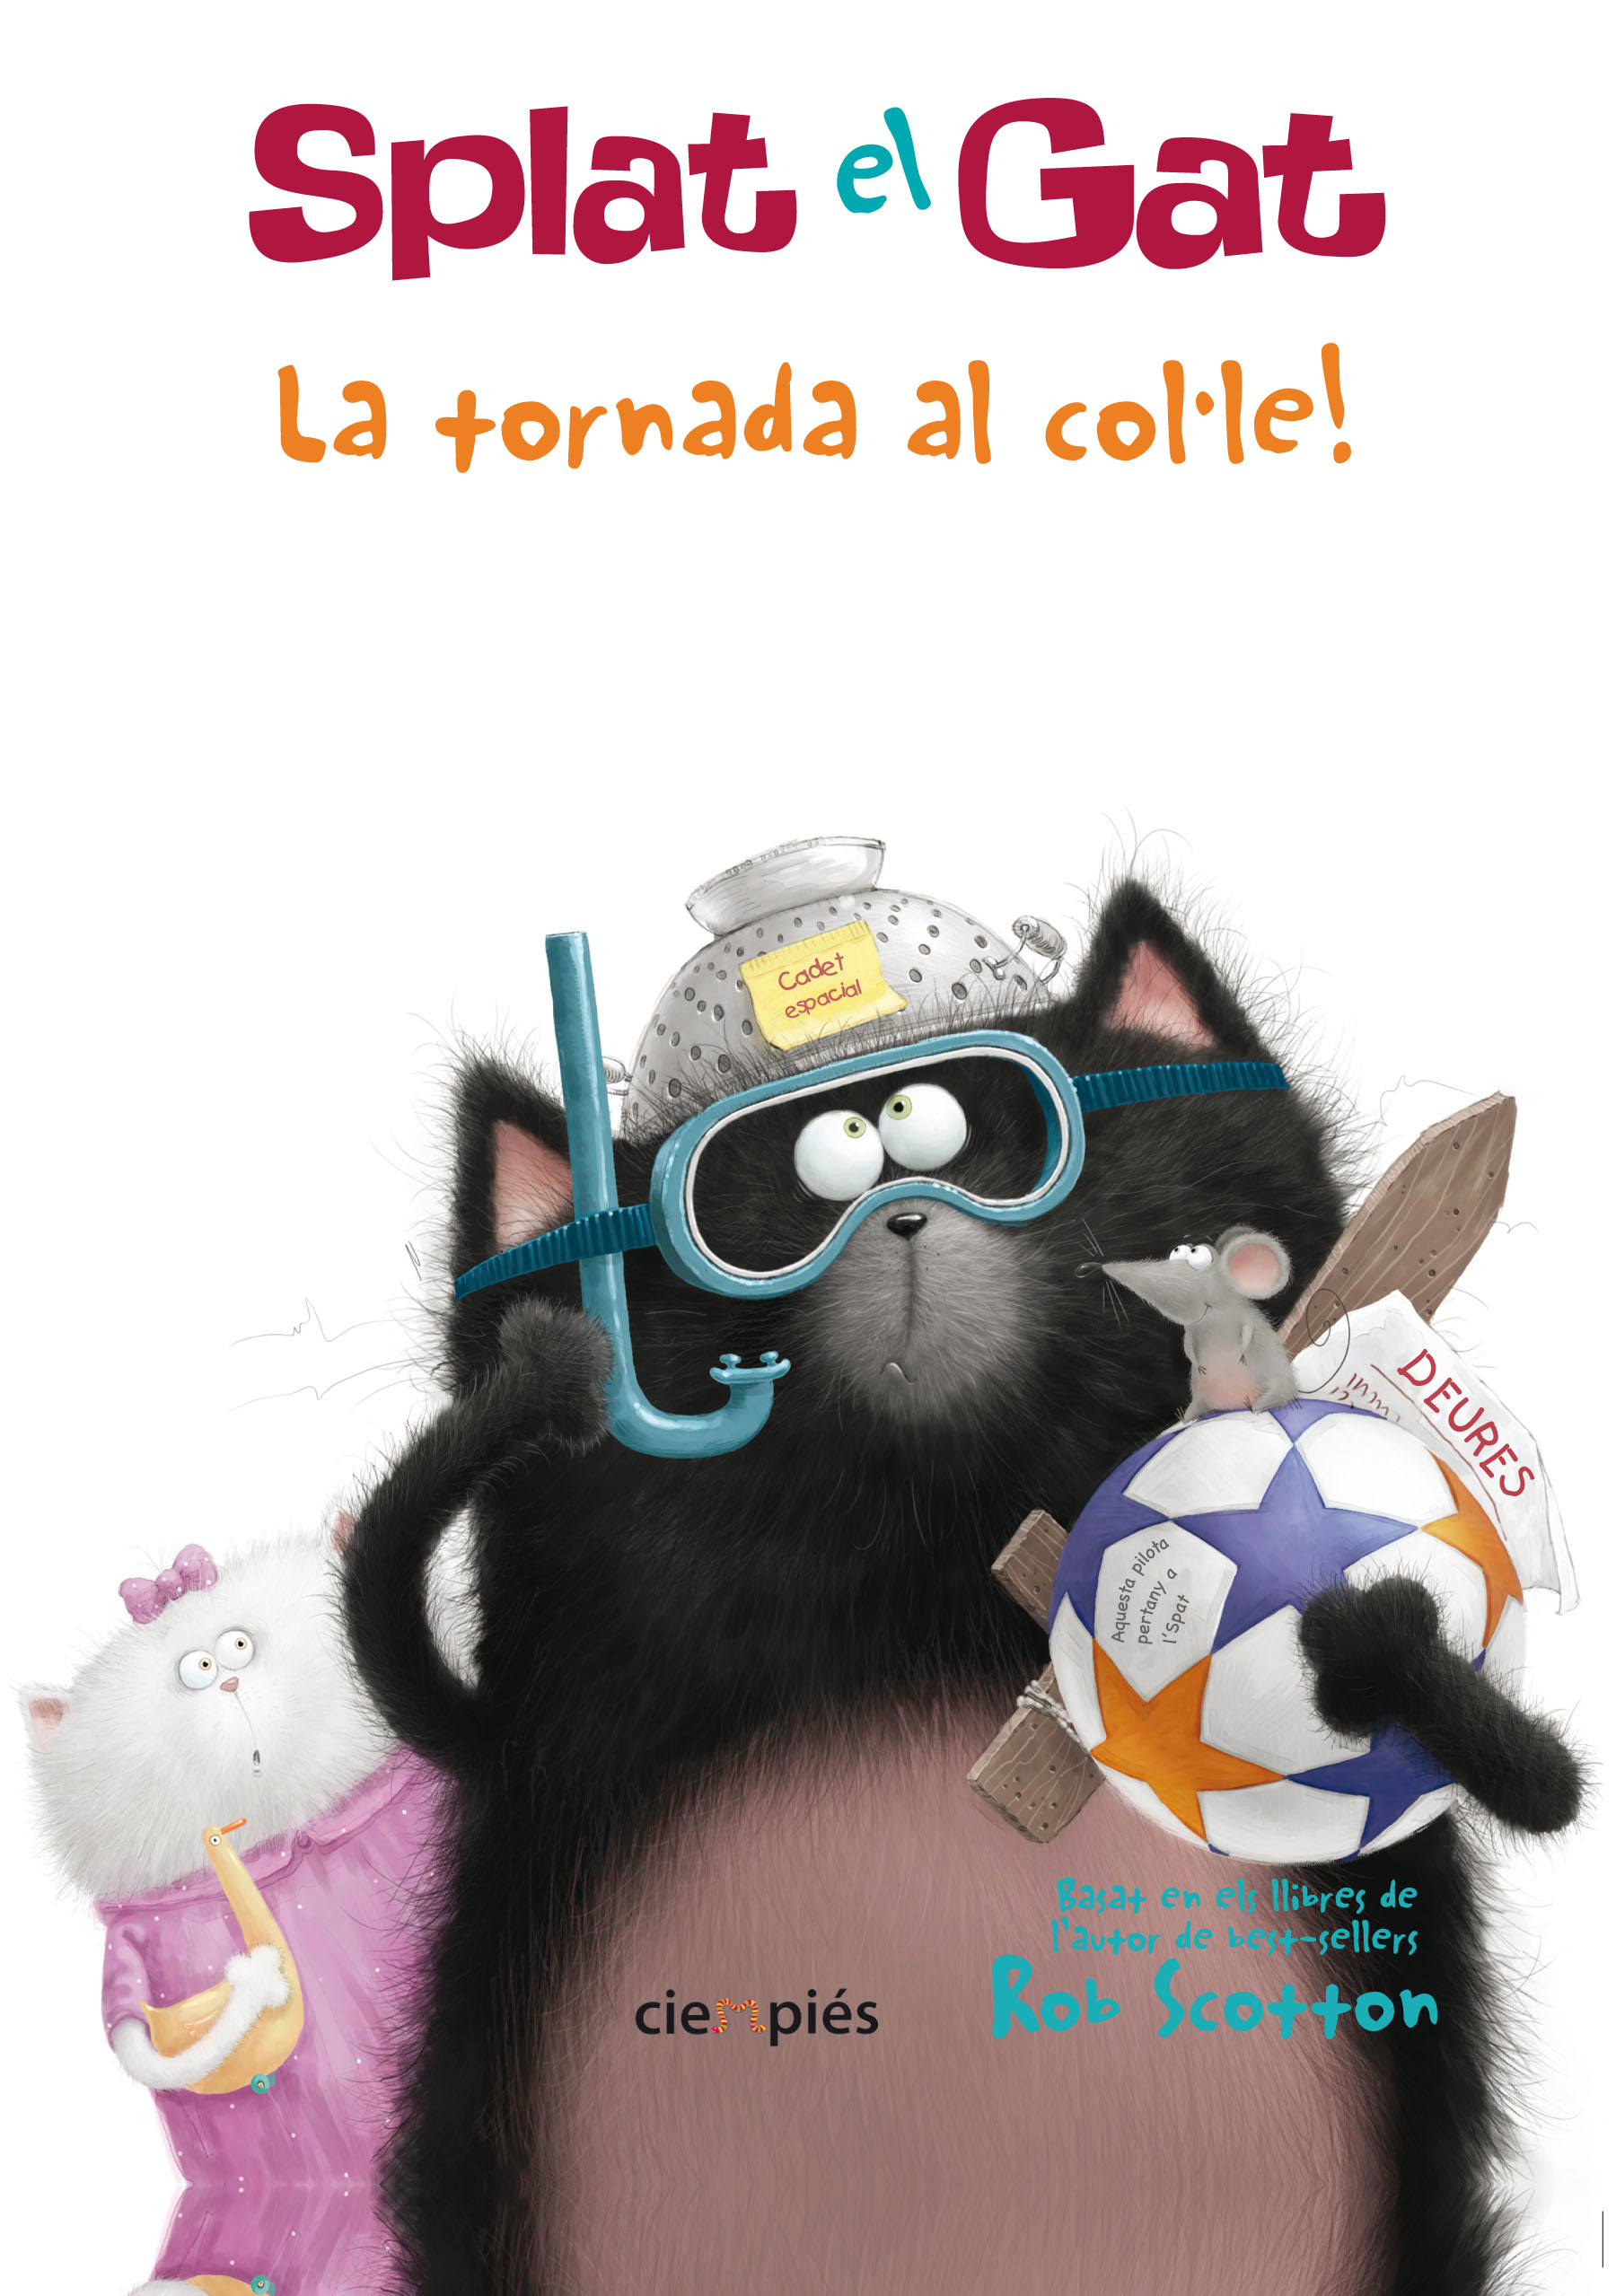 Splat_Tornada Cole_CUBIERTA_CARTONE.indd